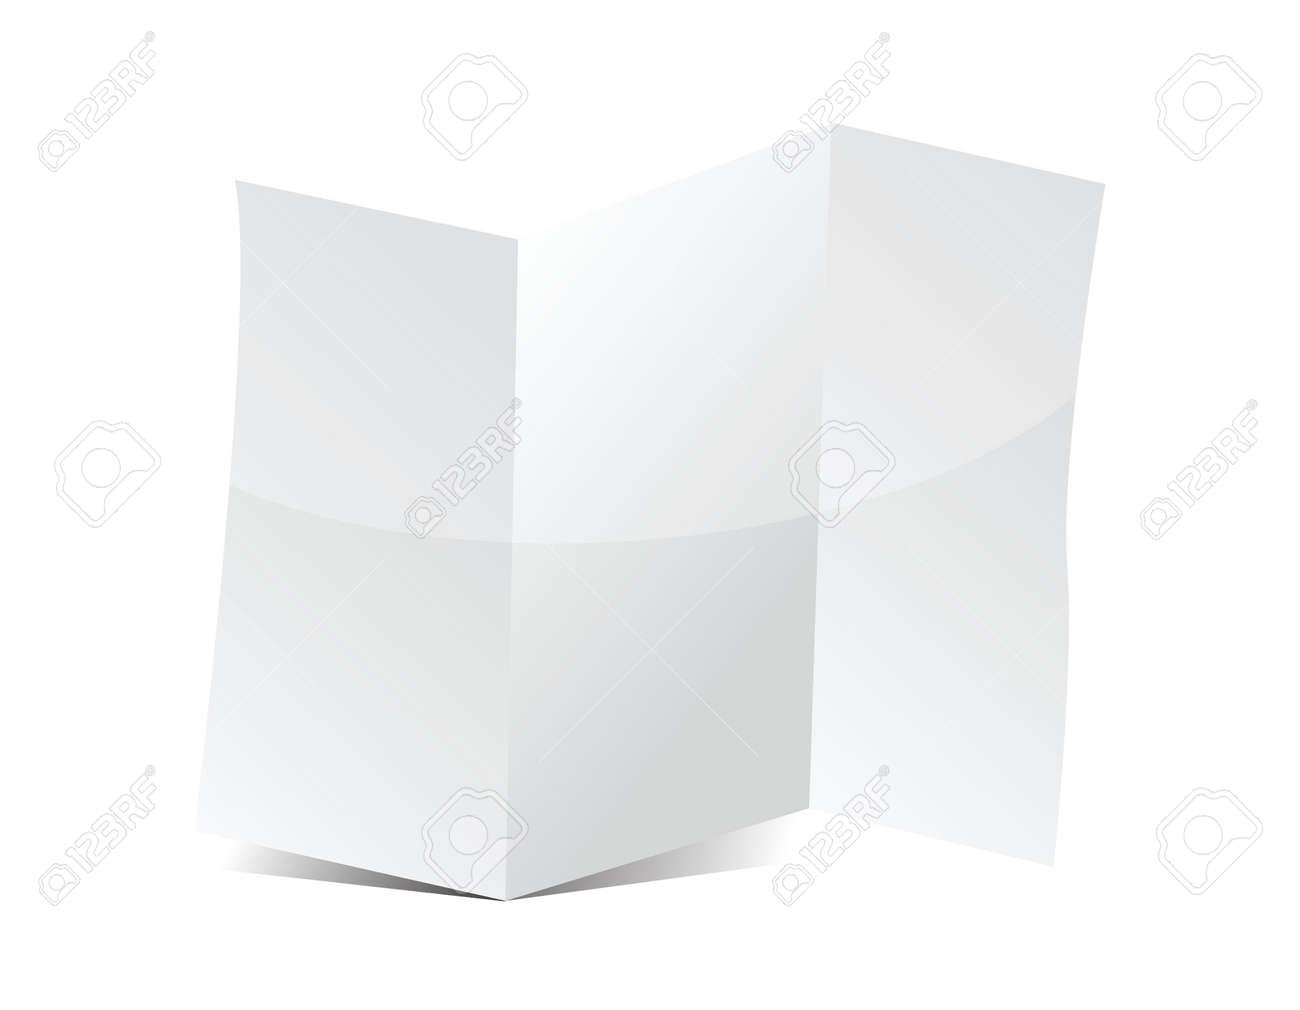 Trifold brochure presentation board for your design illustration Stock Vector - 18278903